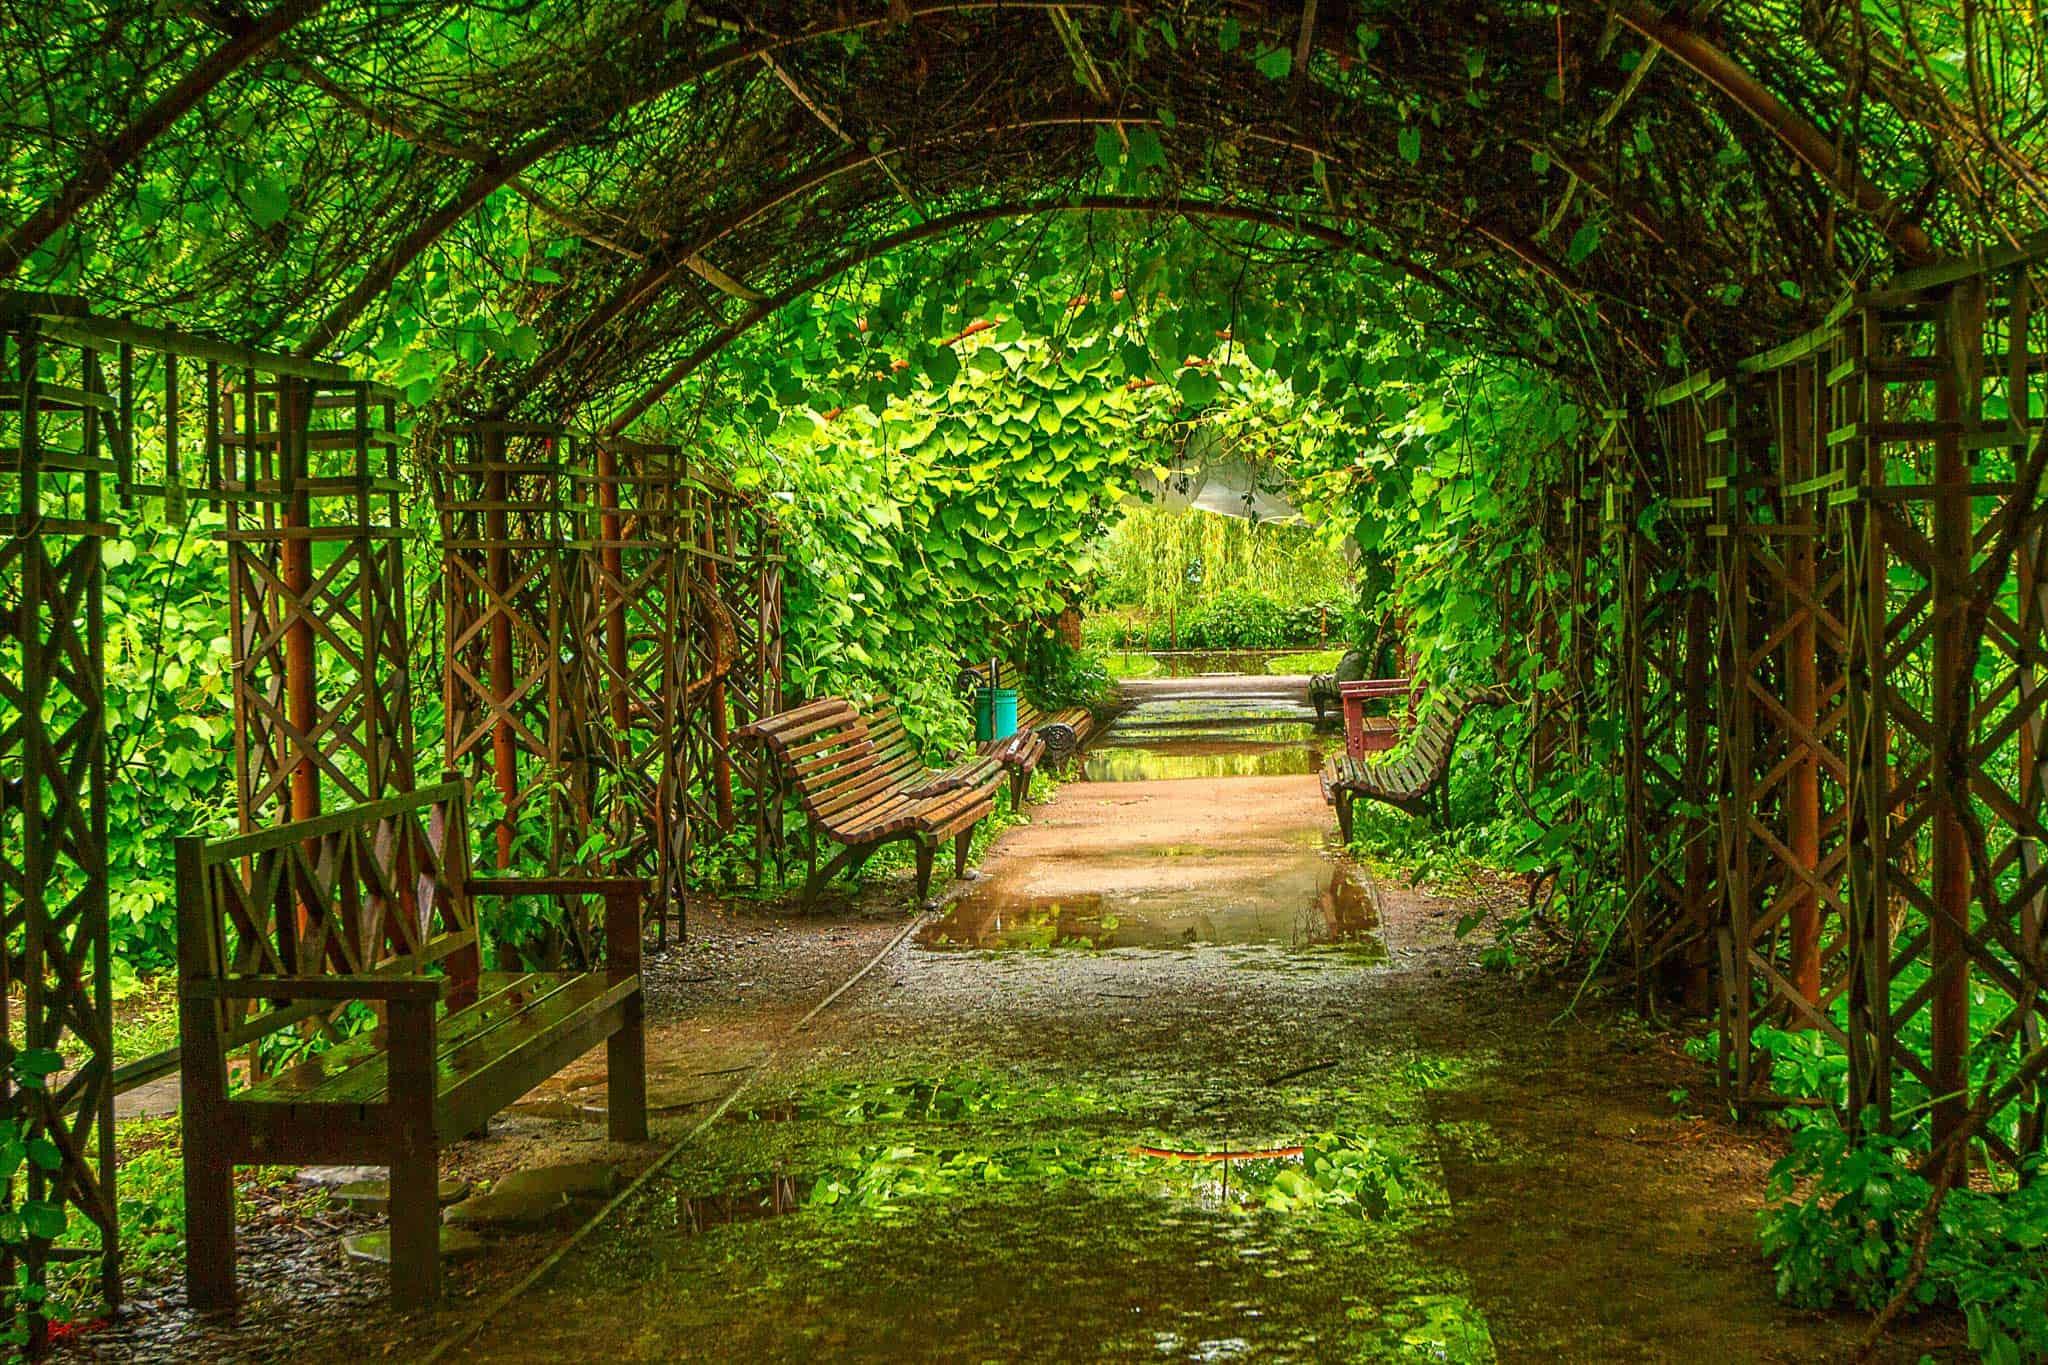 Photo of Сенсорный сад в «Аптекарском огороде»  Сенсорный сад в «Аптекарском огороде» 1 10